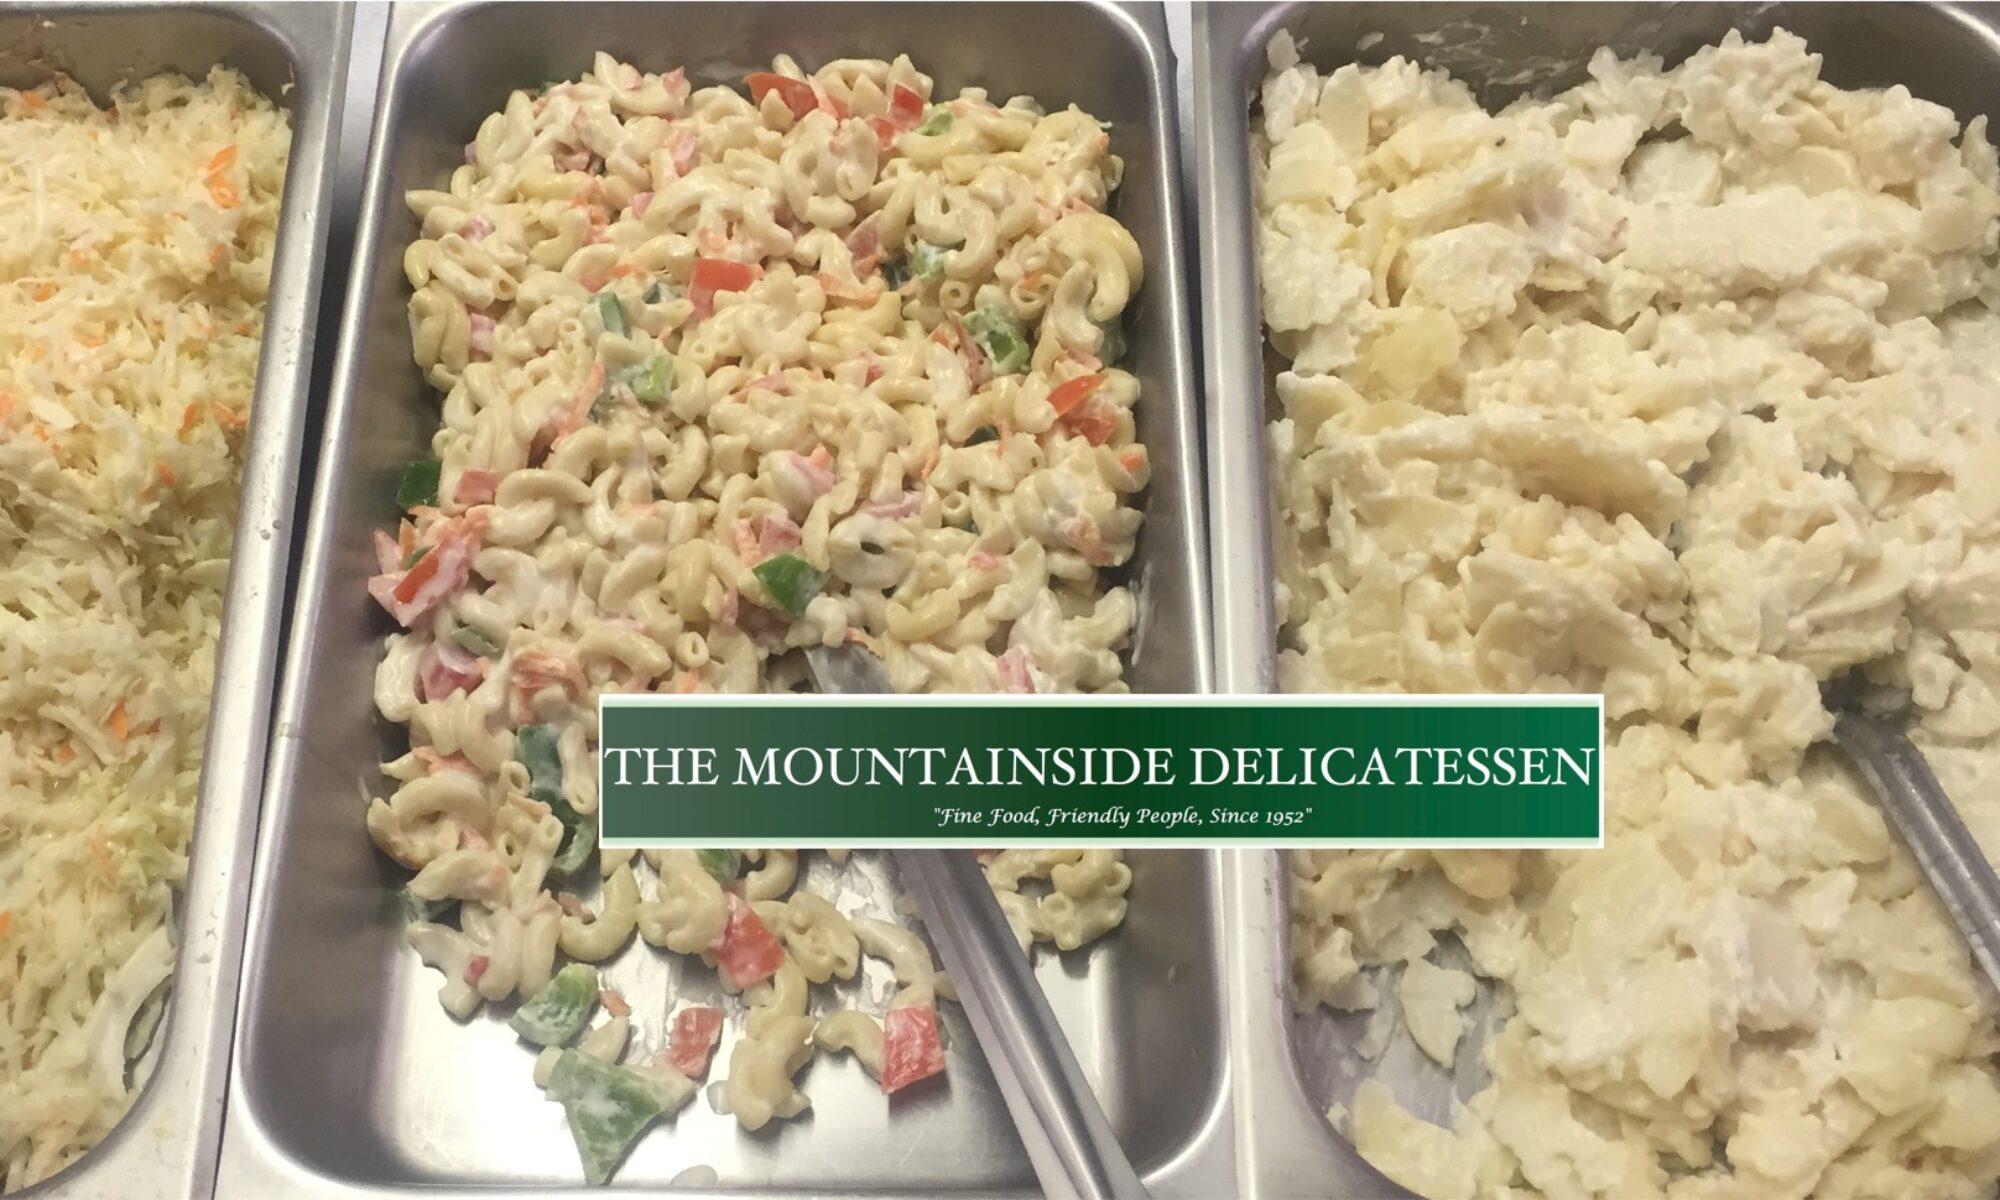 The Mountainside Deli